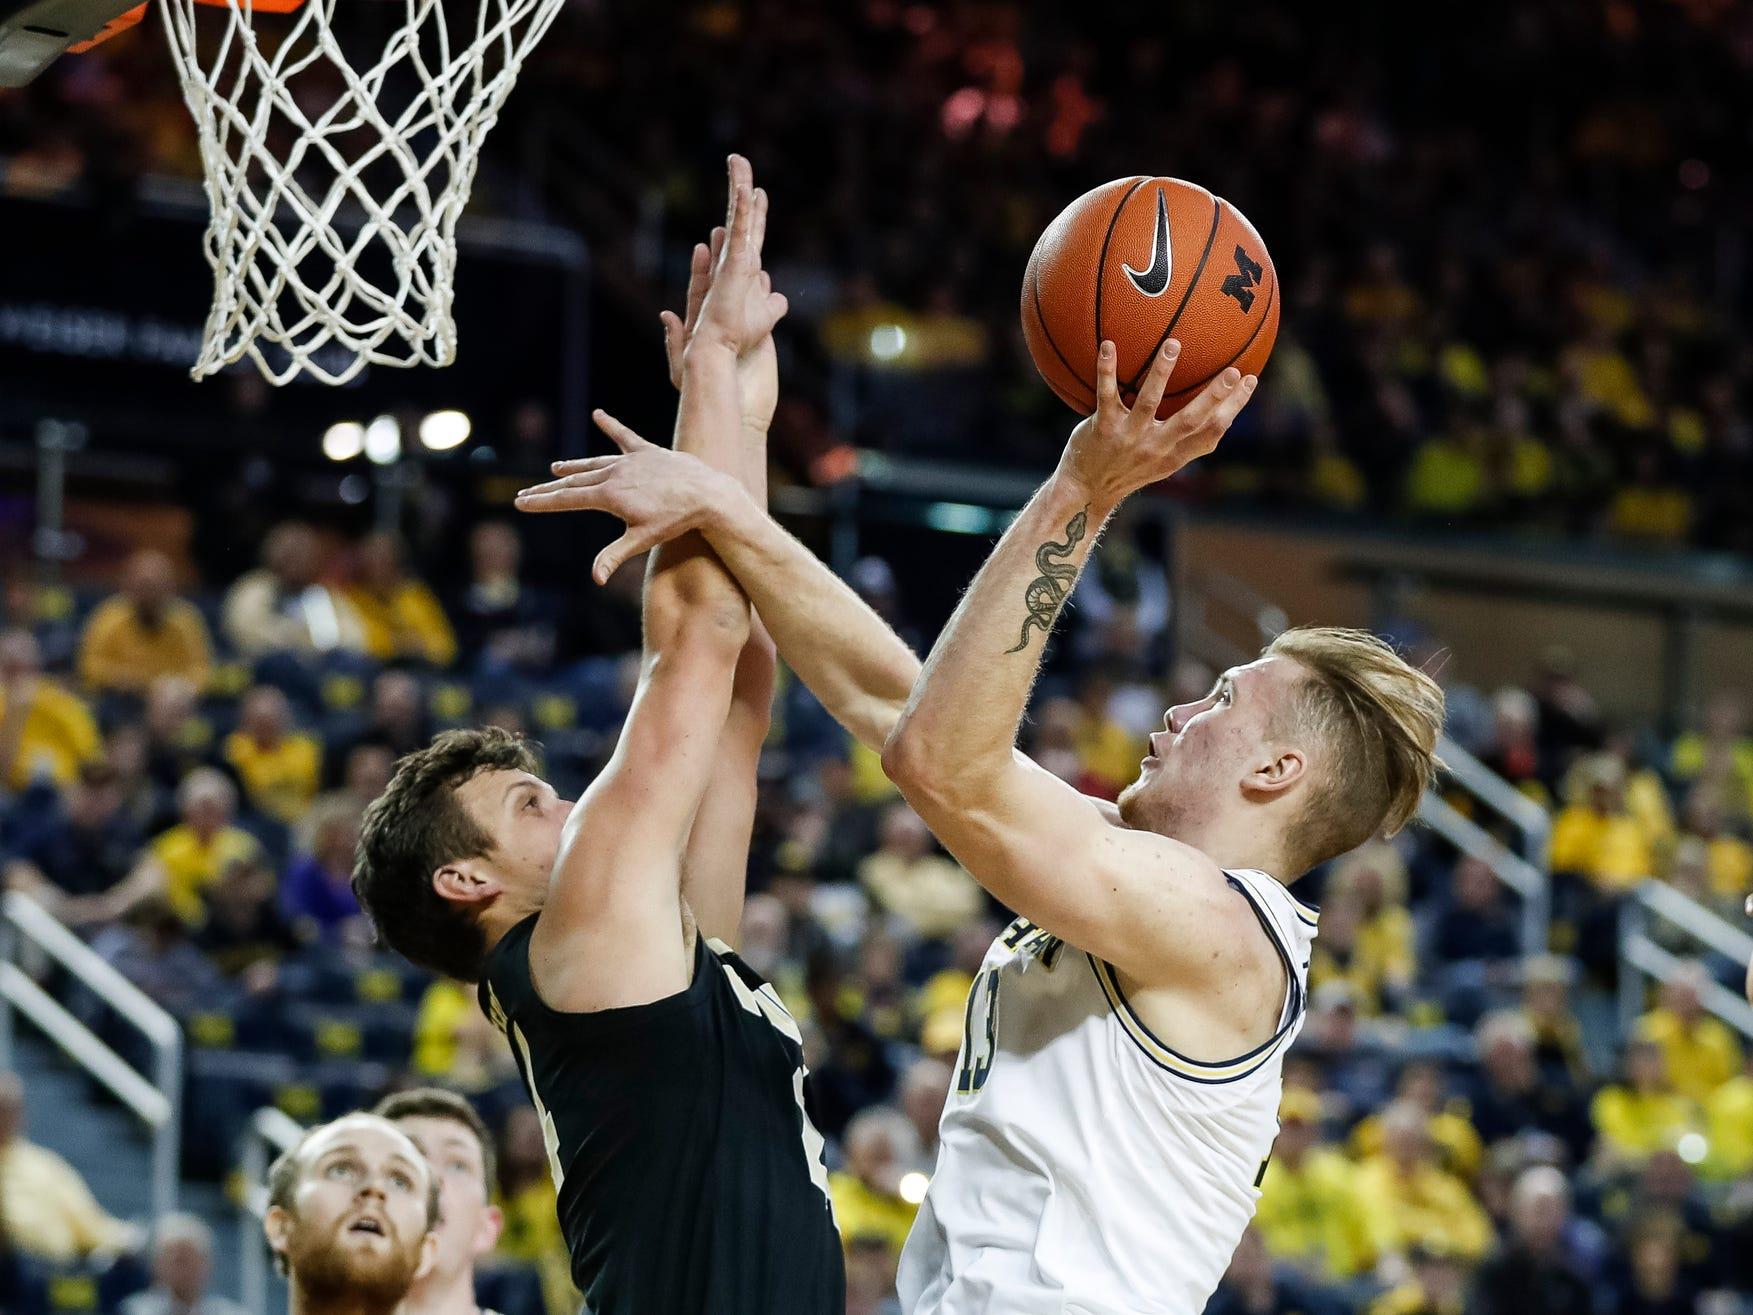 Michigan forward Ignas Brazdeikis (13) goes for the basket against Purdue forward Grady Eifert (24) during the first half at Crisler Center on Saturday, Dec. 1, 2018.